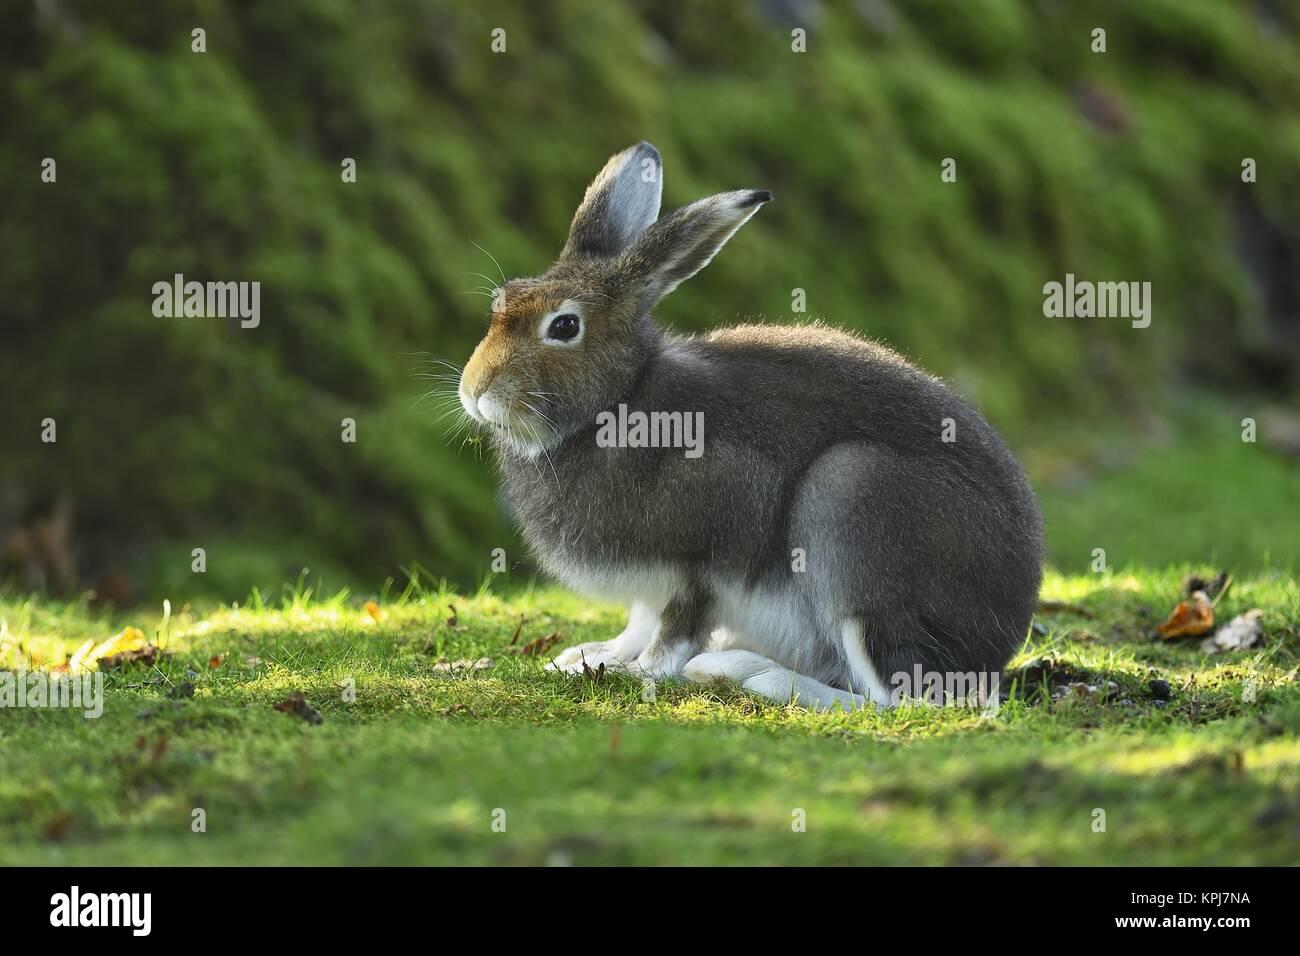 Alpine Hare (Lepus timidus varronis) in coat change, sedentary, canton Schwyz, Switzerland - Stock Image